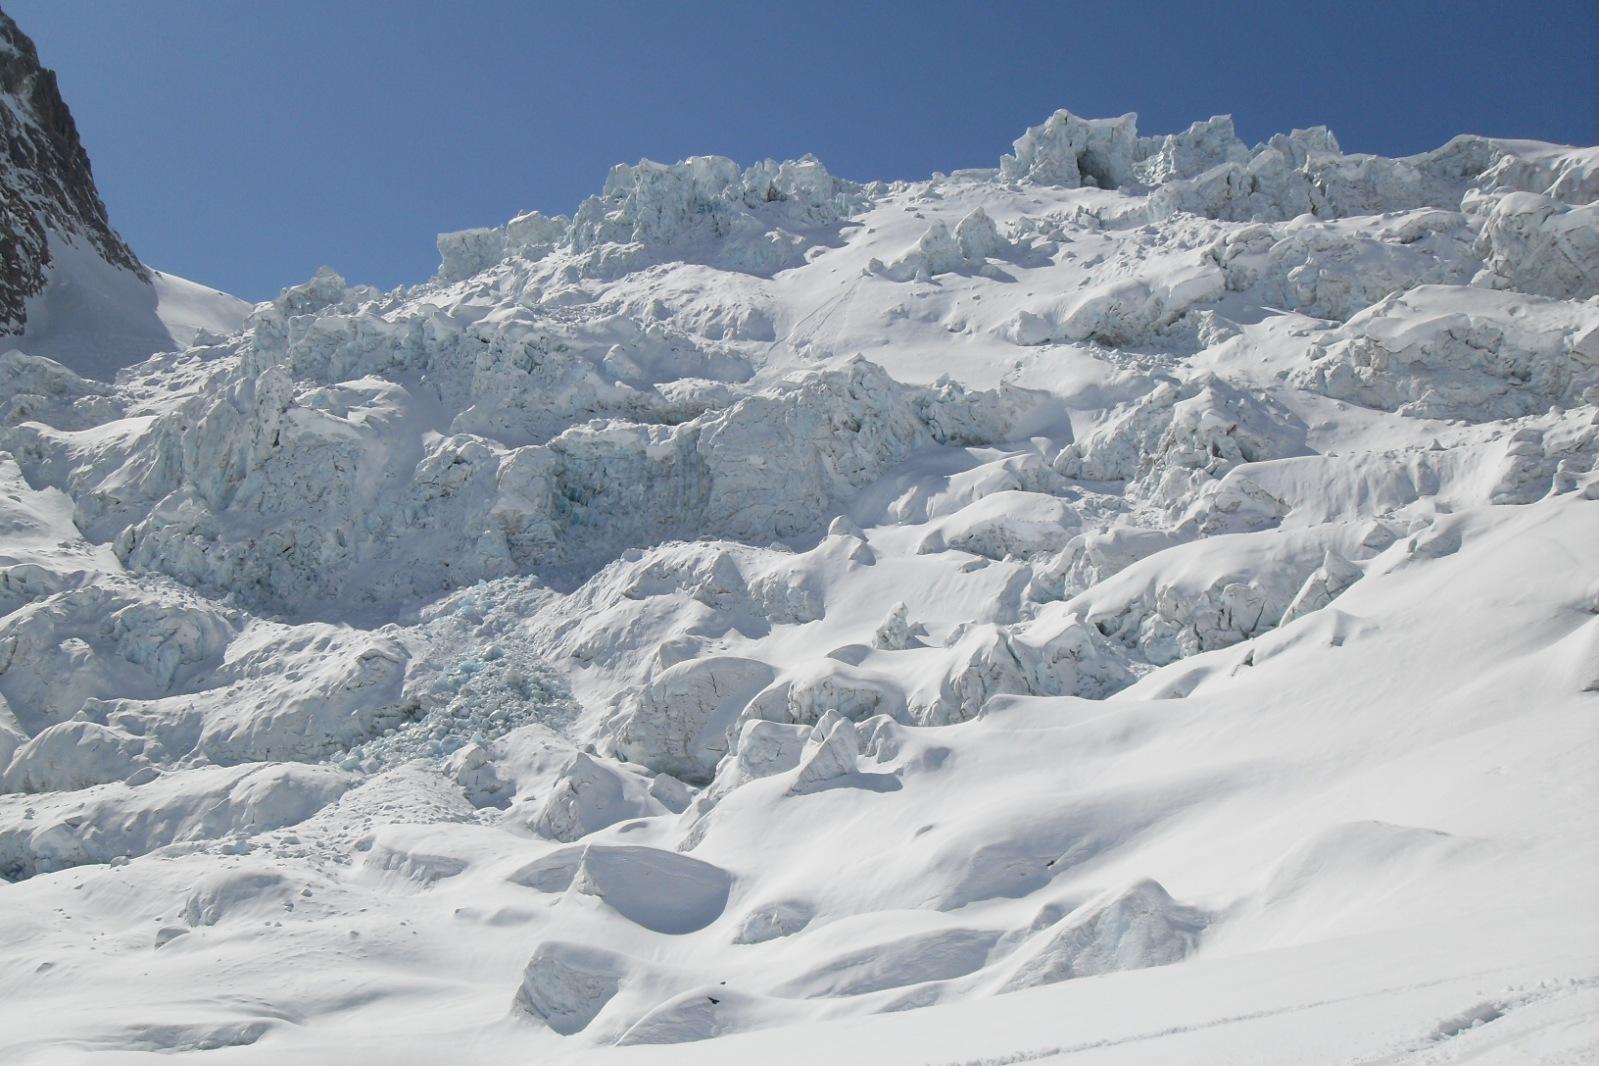 Vallée Blanche